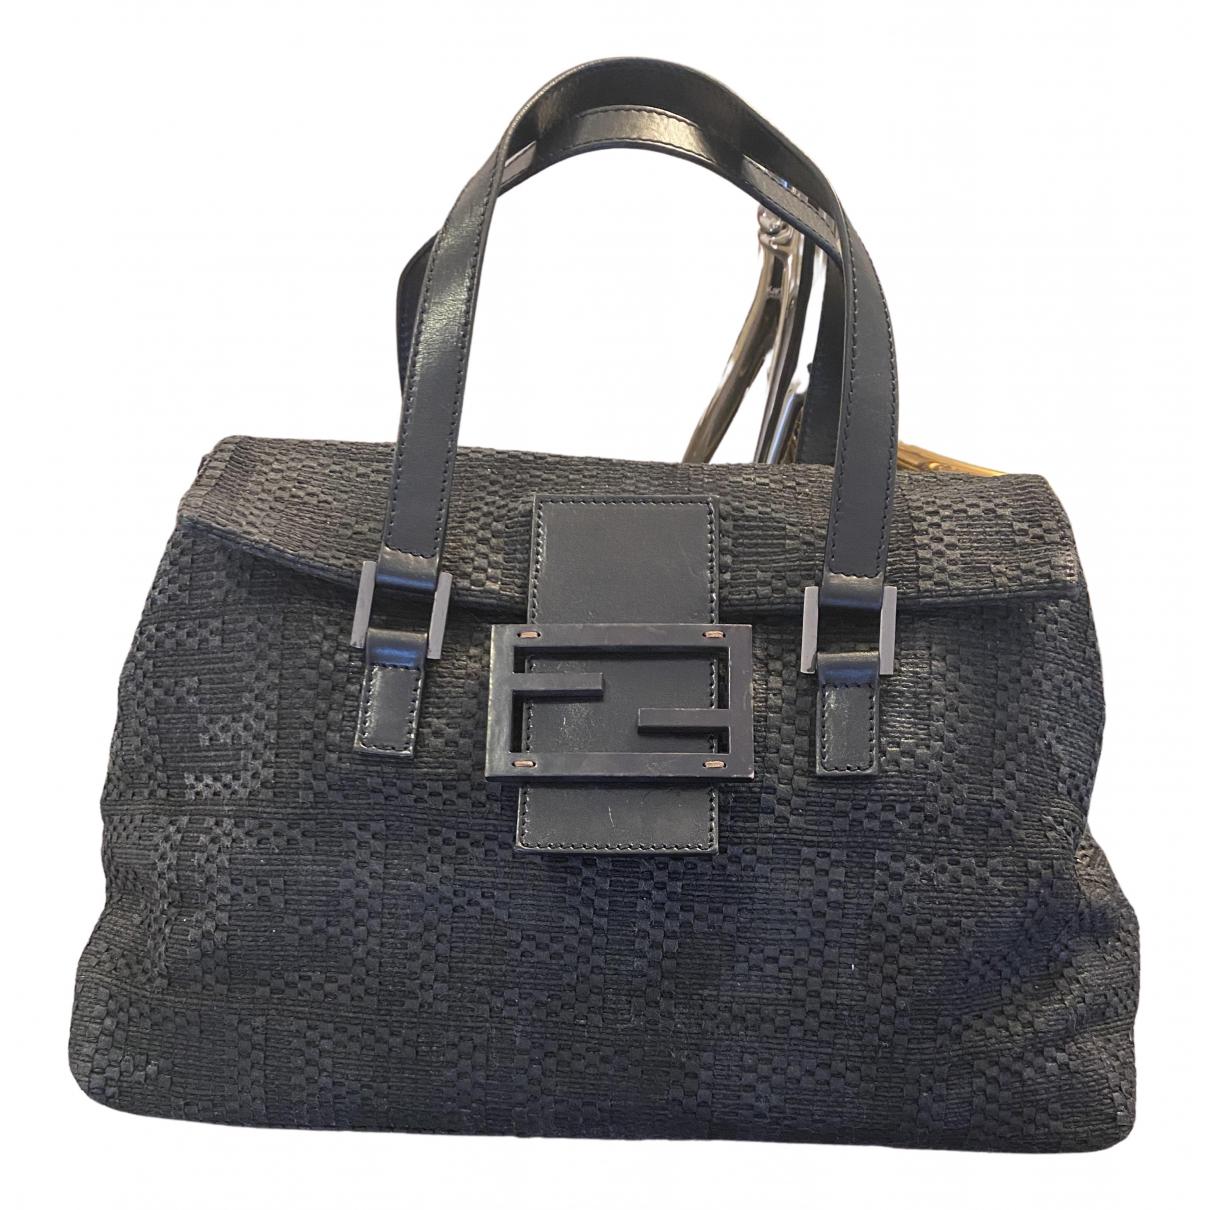 Fendi N Black Cloth handbag for Women N